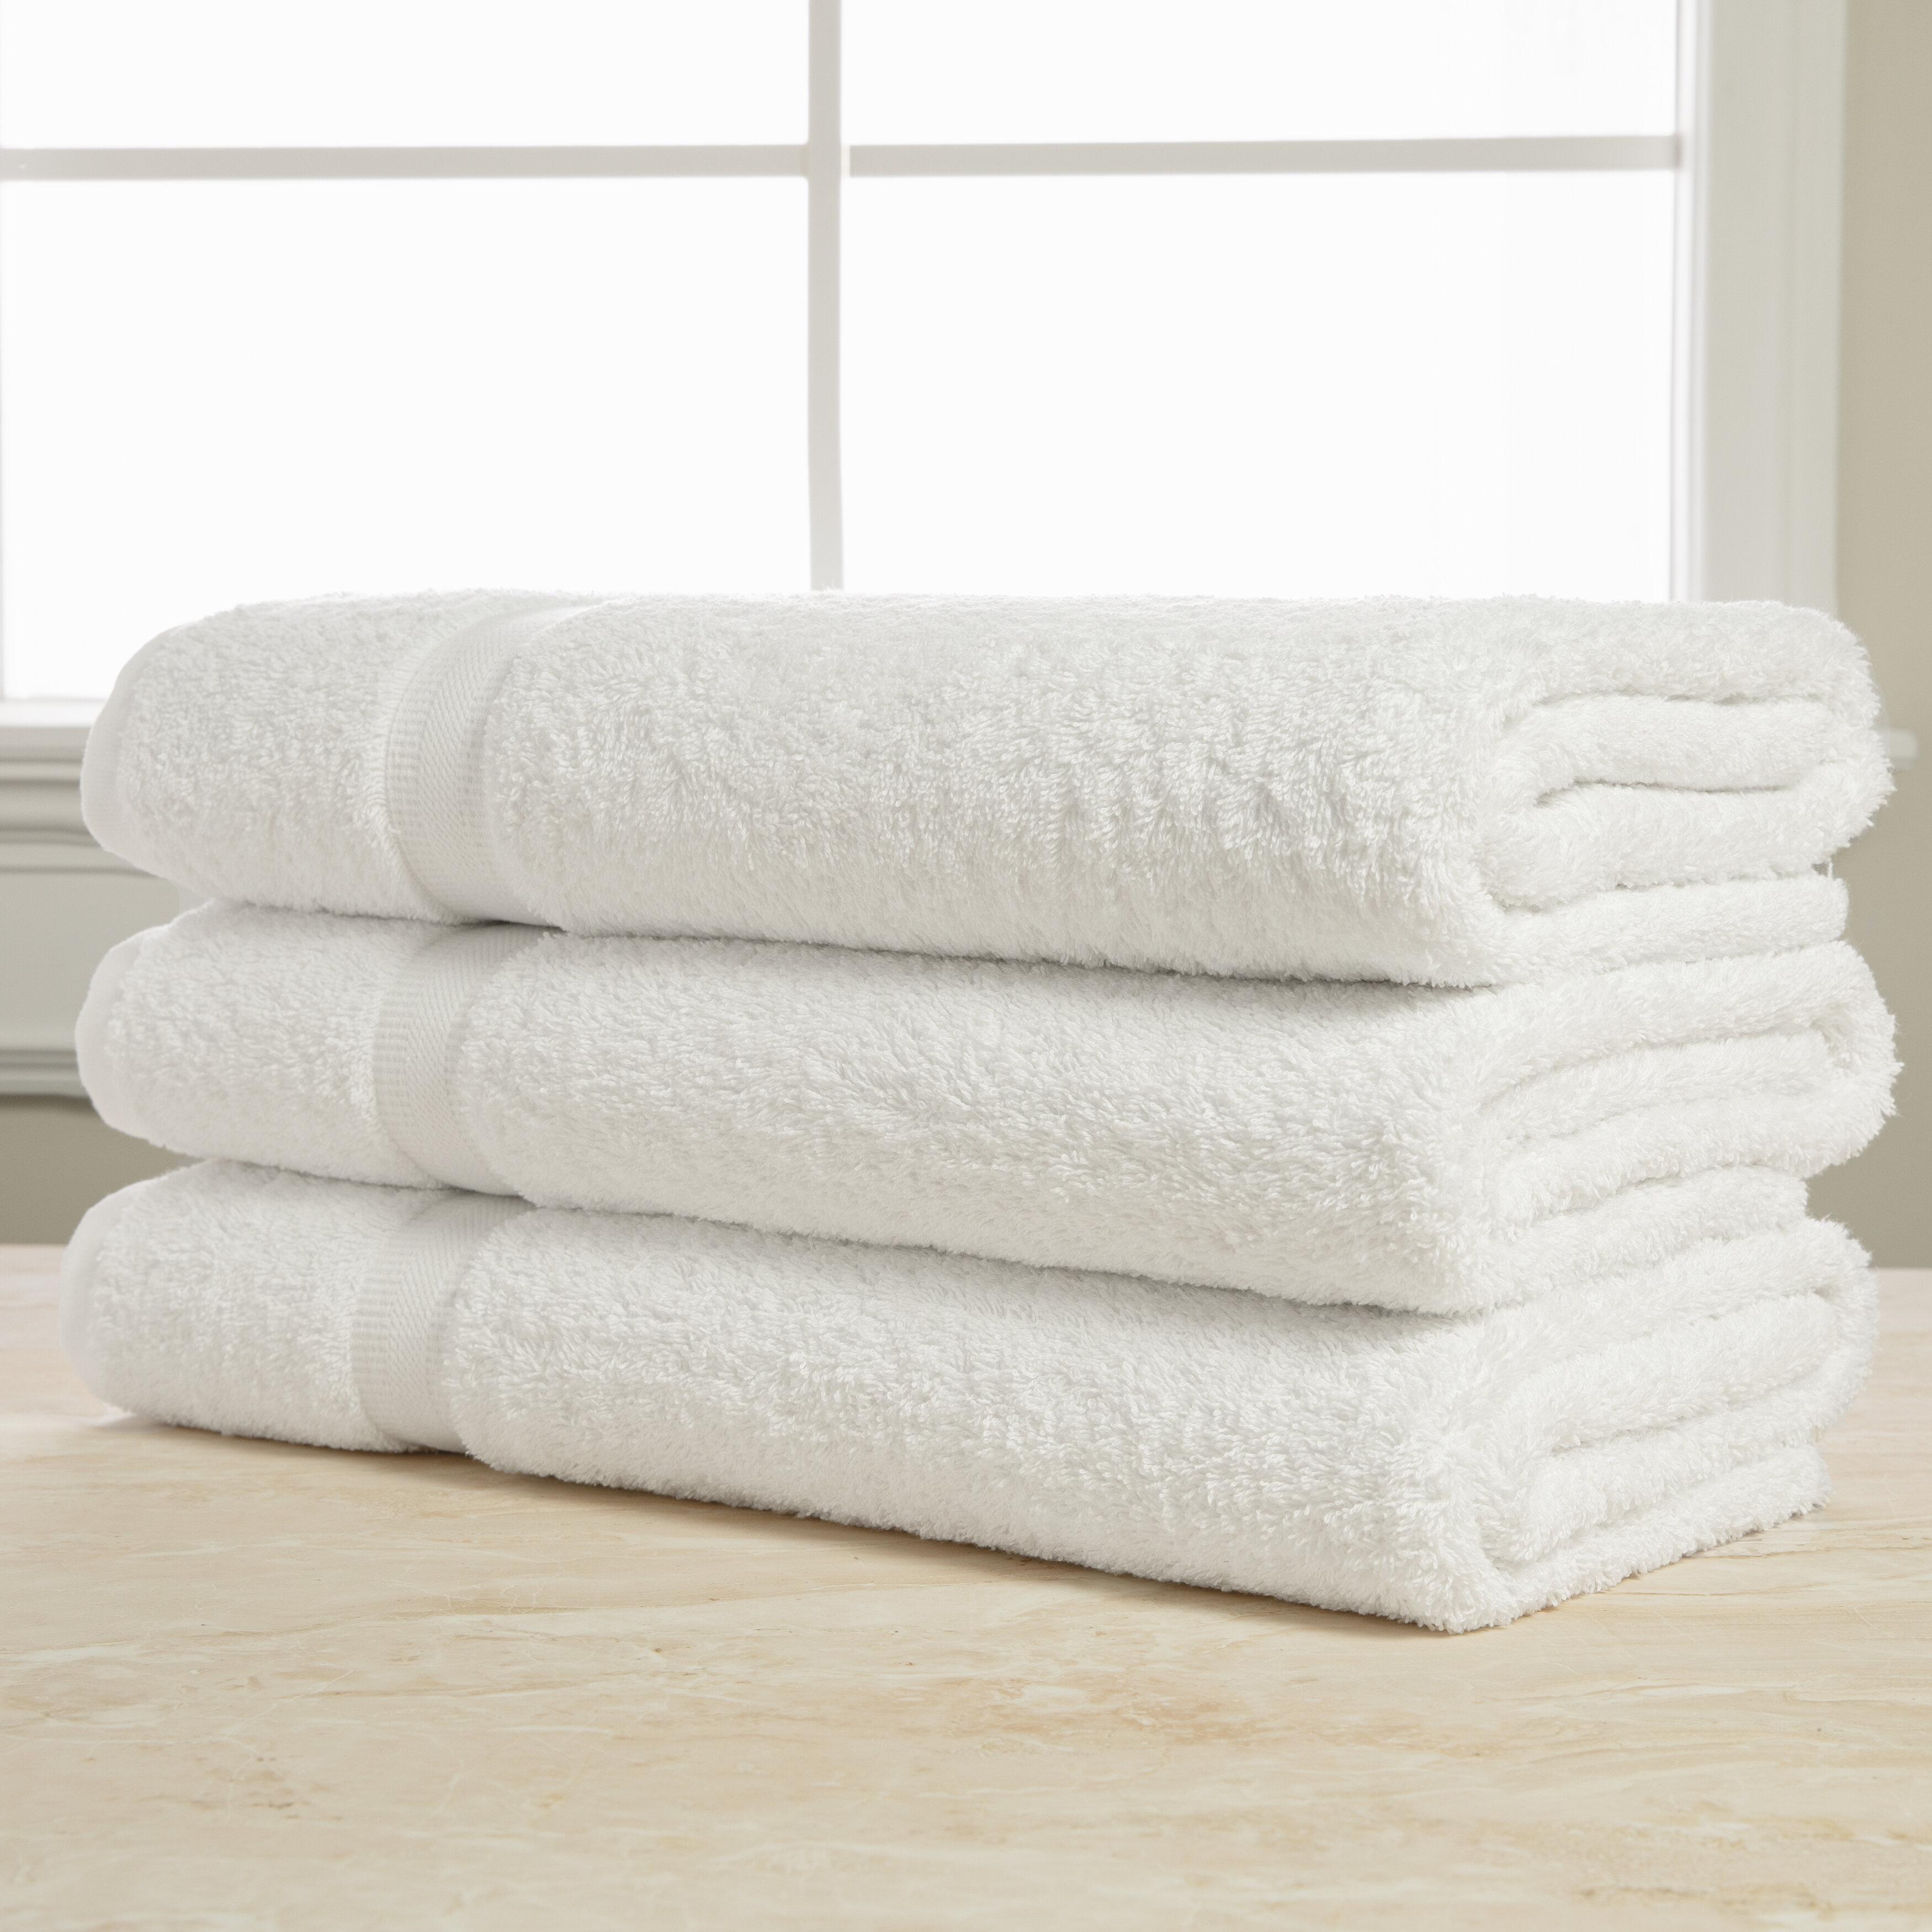 Sobel Westex Royal Excellence 3 Piece 100 Cotton Bath Sheet Towel Set Reviews Wayfair